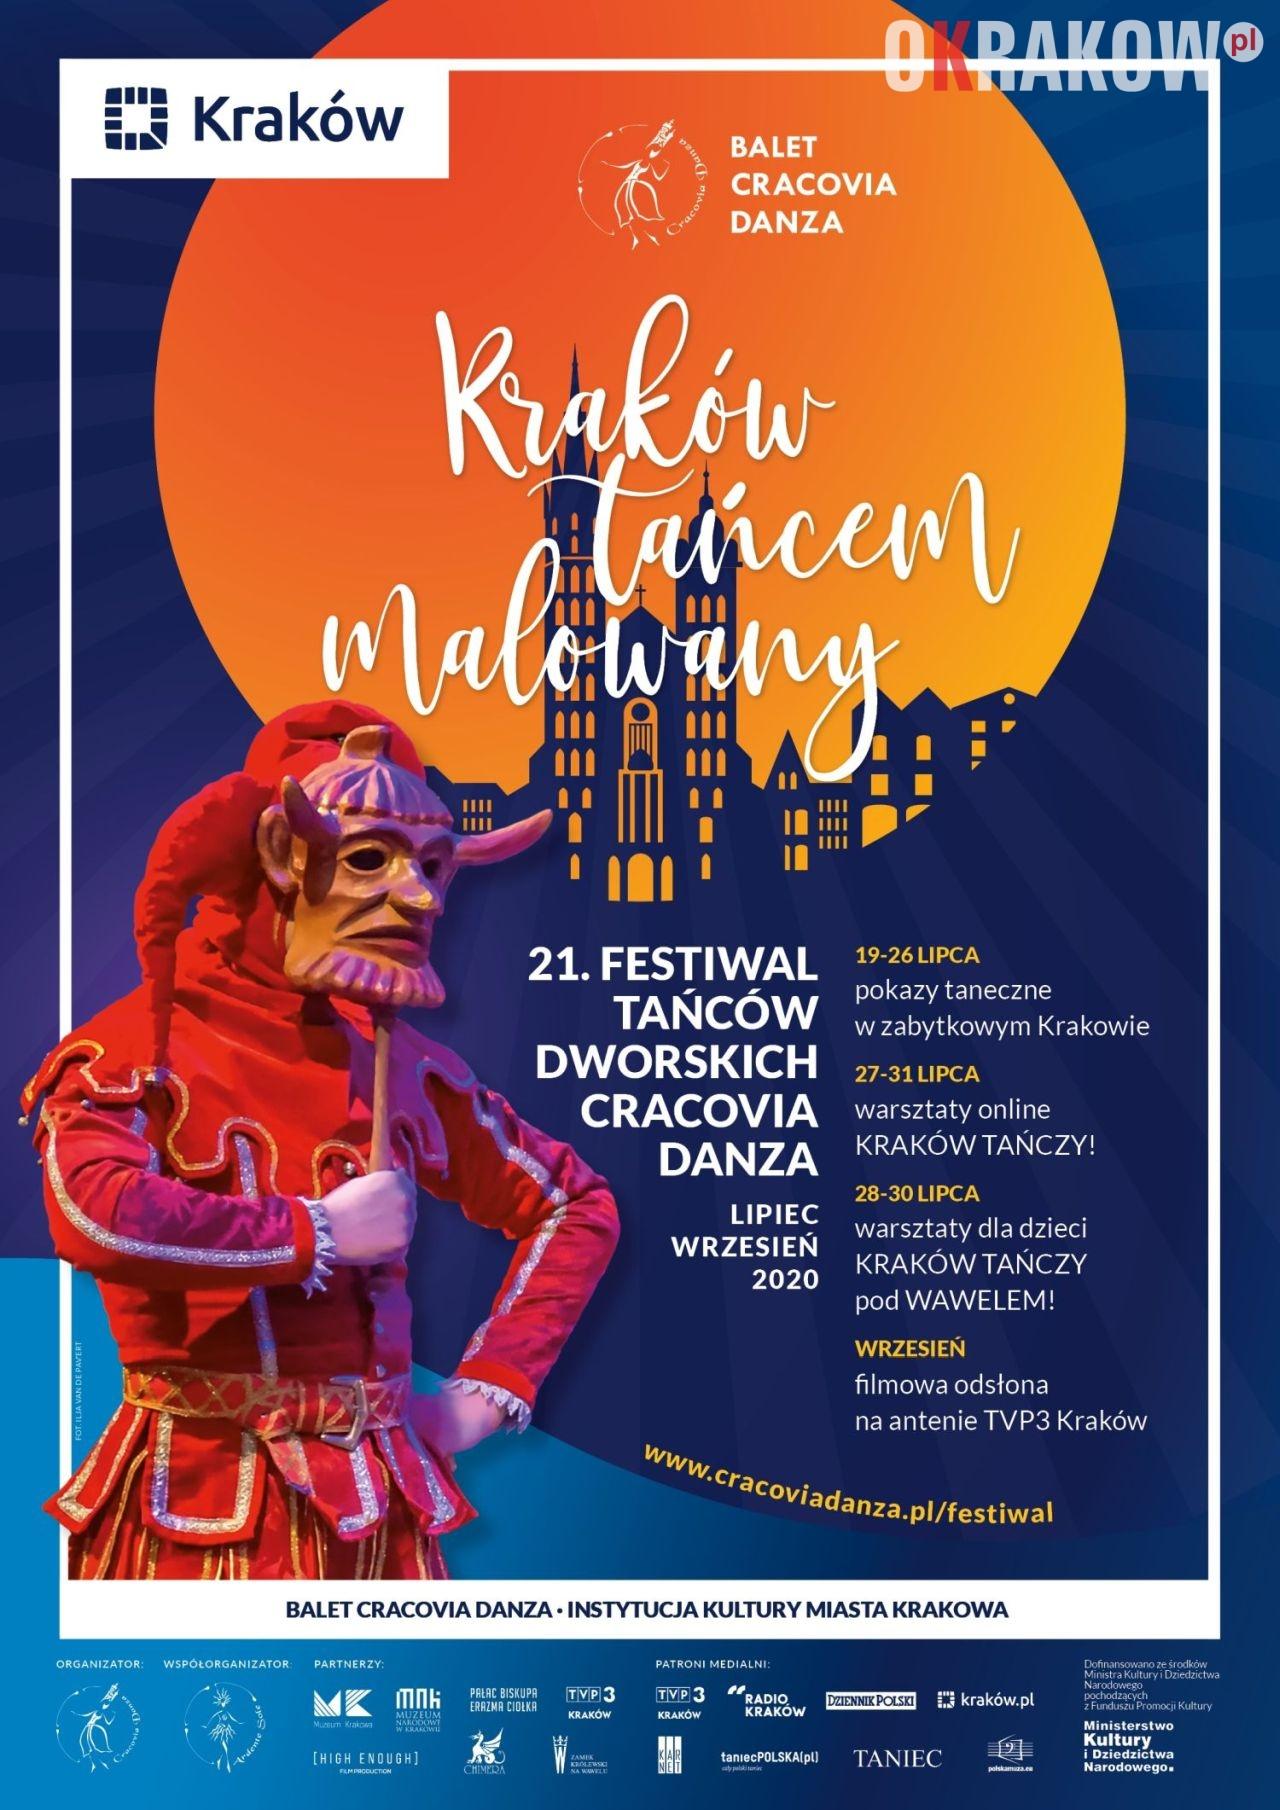 "21. festiwal tancow dworskich cracovia danza plakat 212x300 - Kraków tańcem malowany 21. Festiwal Tańców Dworskich ""Cracovia Danza"" lipiec-wrzesień 2020"